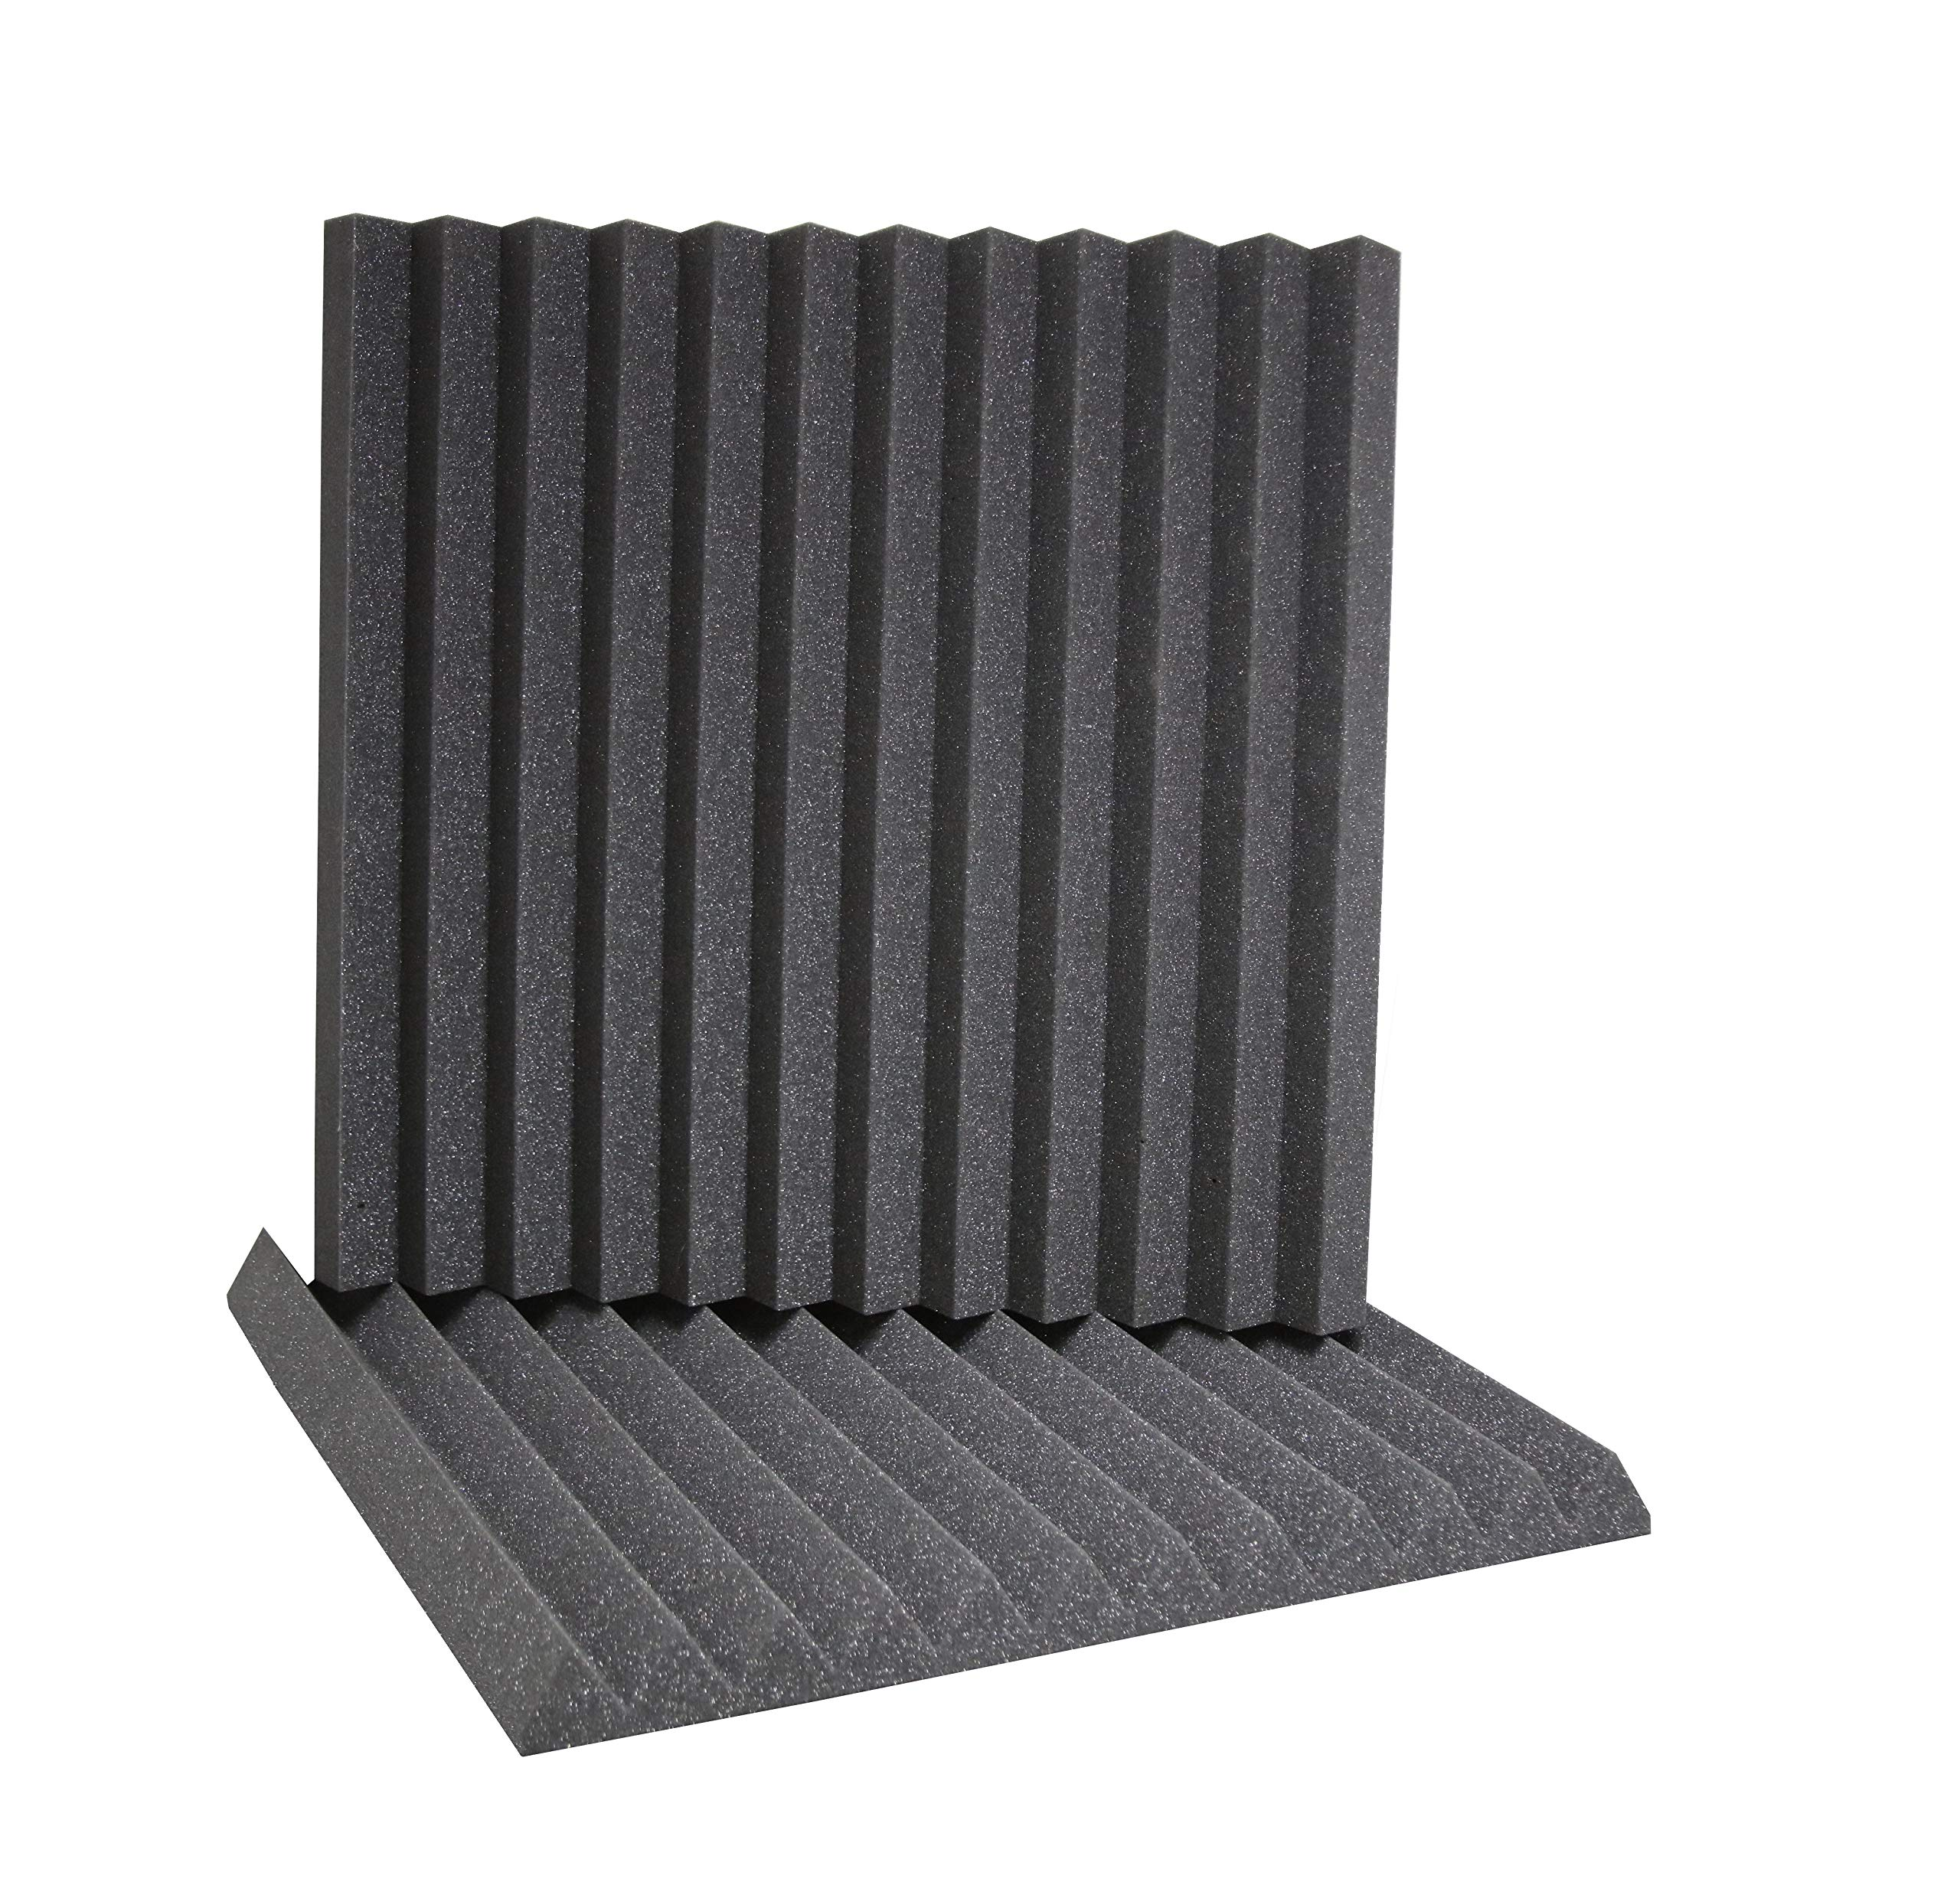 ATS Wedge Foam Acoustic Panels (Charcoal) - 24x24x2 (6pk)